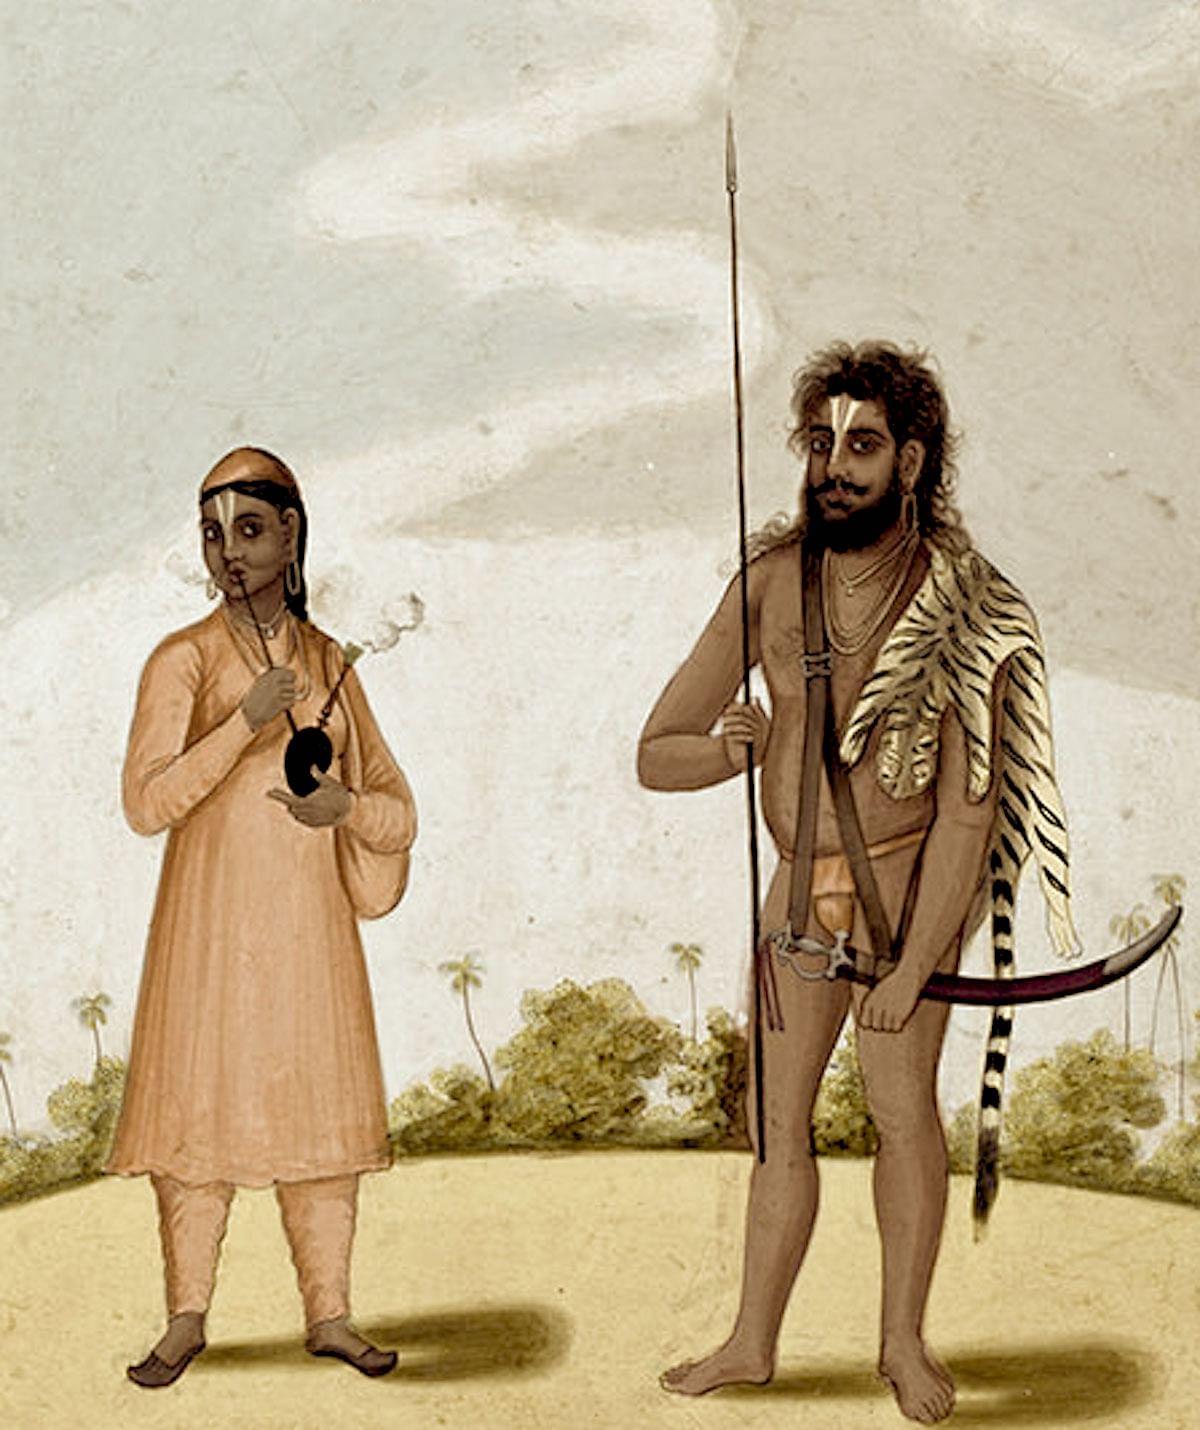 The Tradition of Dharma-Veeras and the Yogi-Warrior Contingent of Rajaputana as Precursors to the Sanyasi Freedom Movement